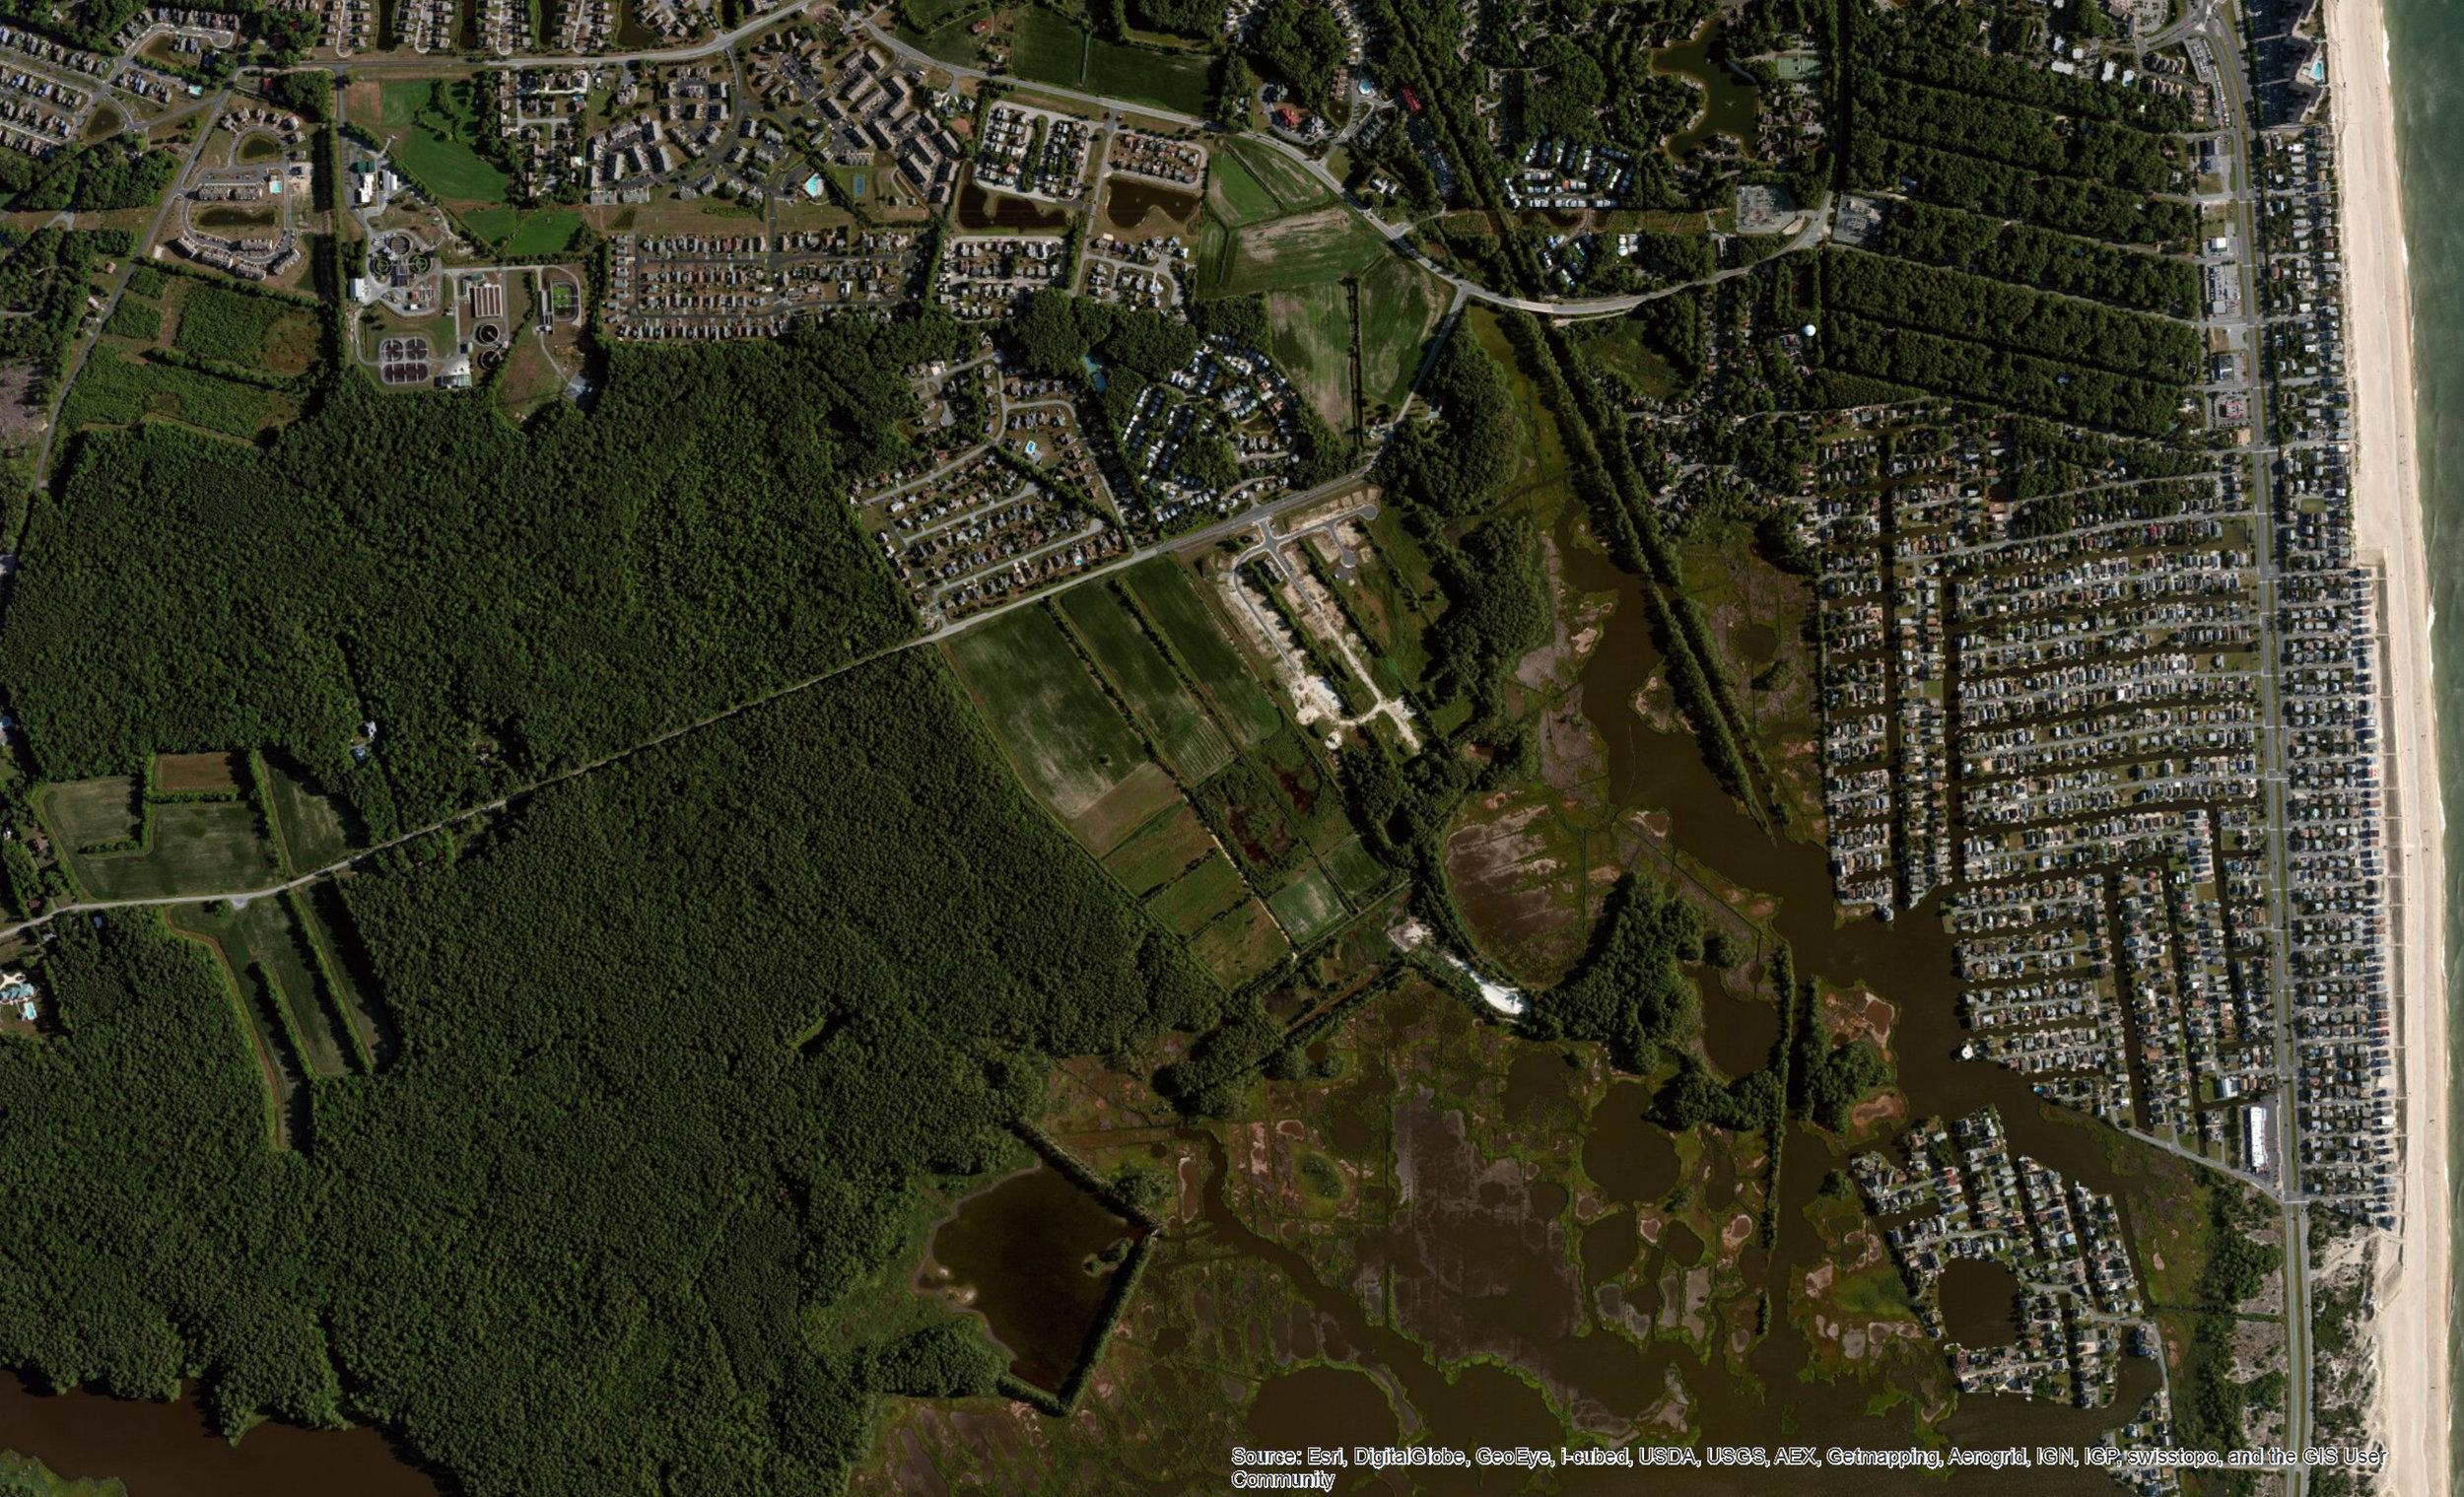 south-bethany-base.jpg